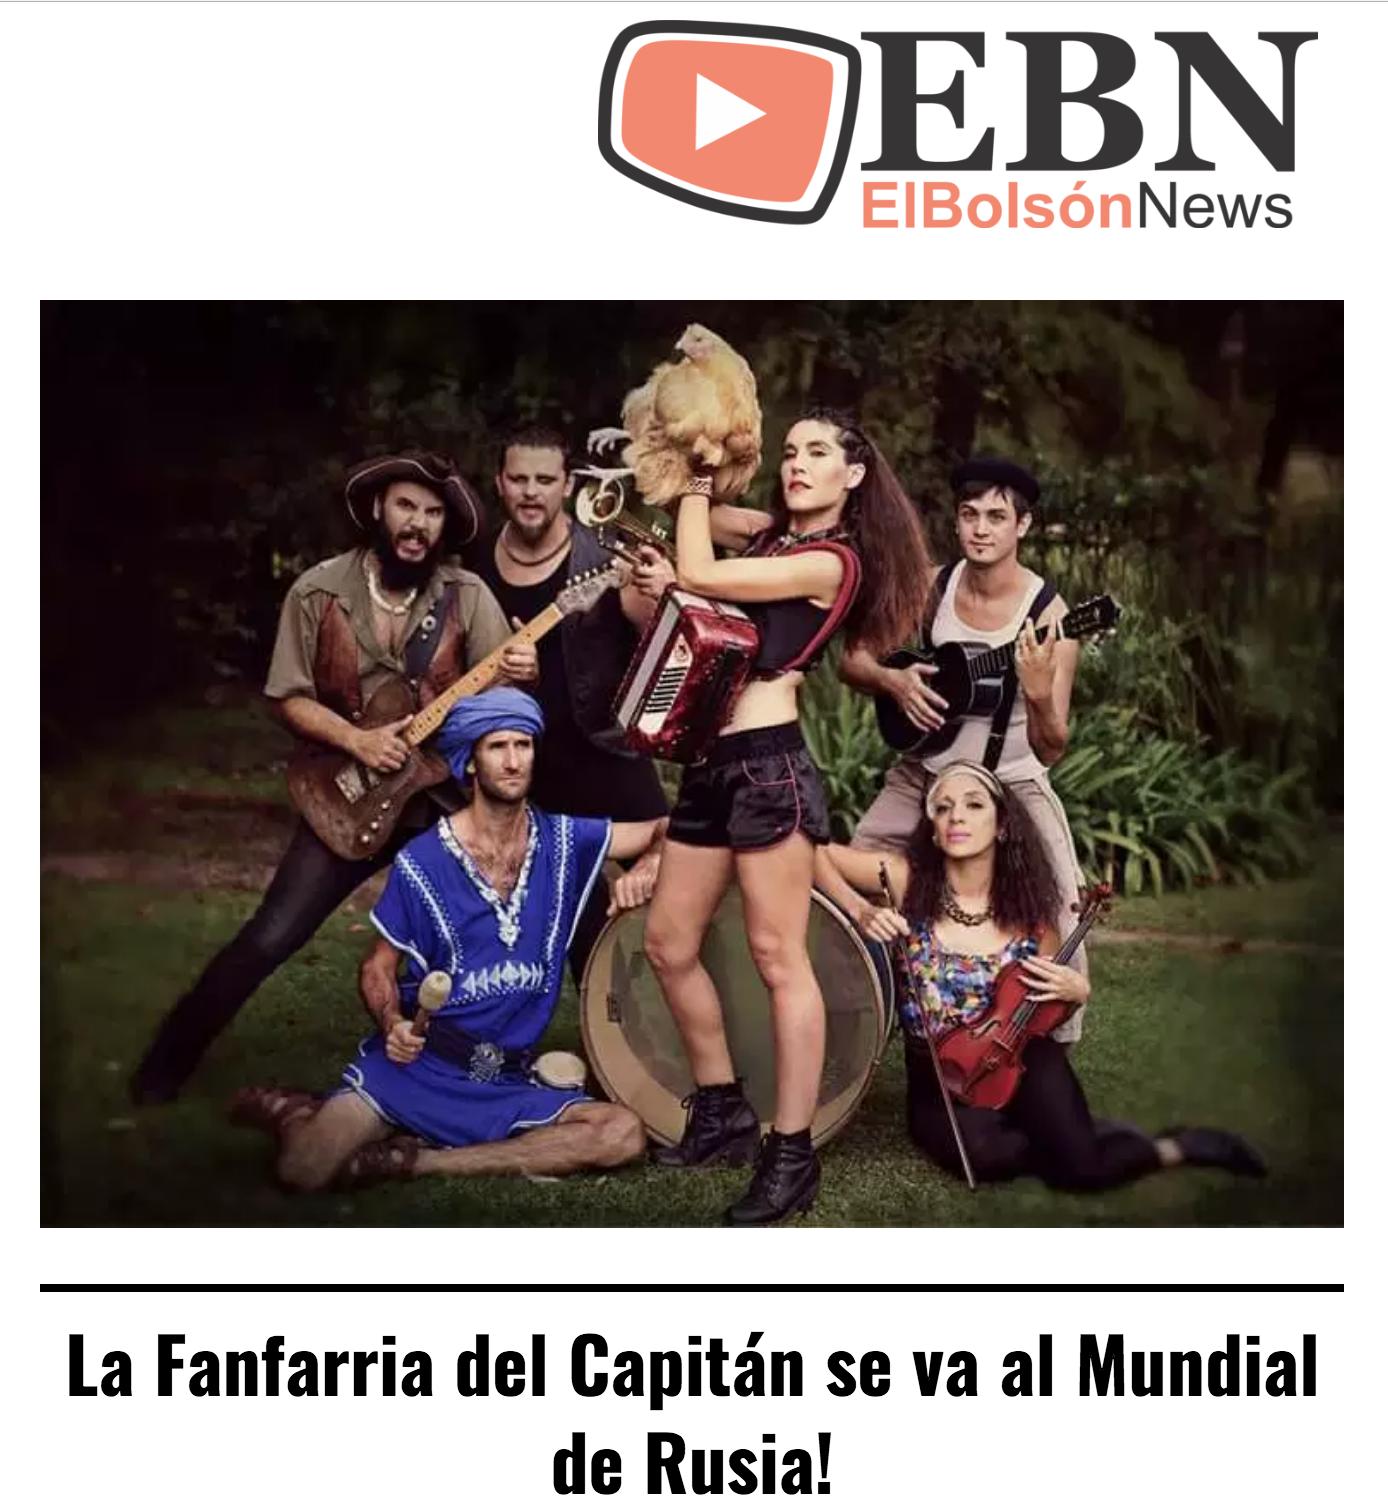 EL BOLSON NEWS